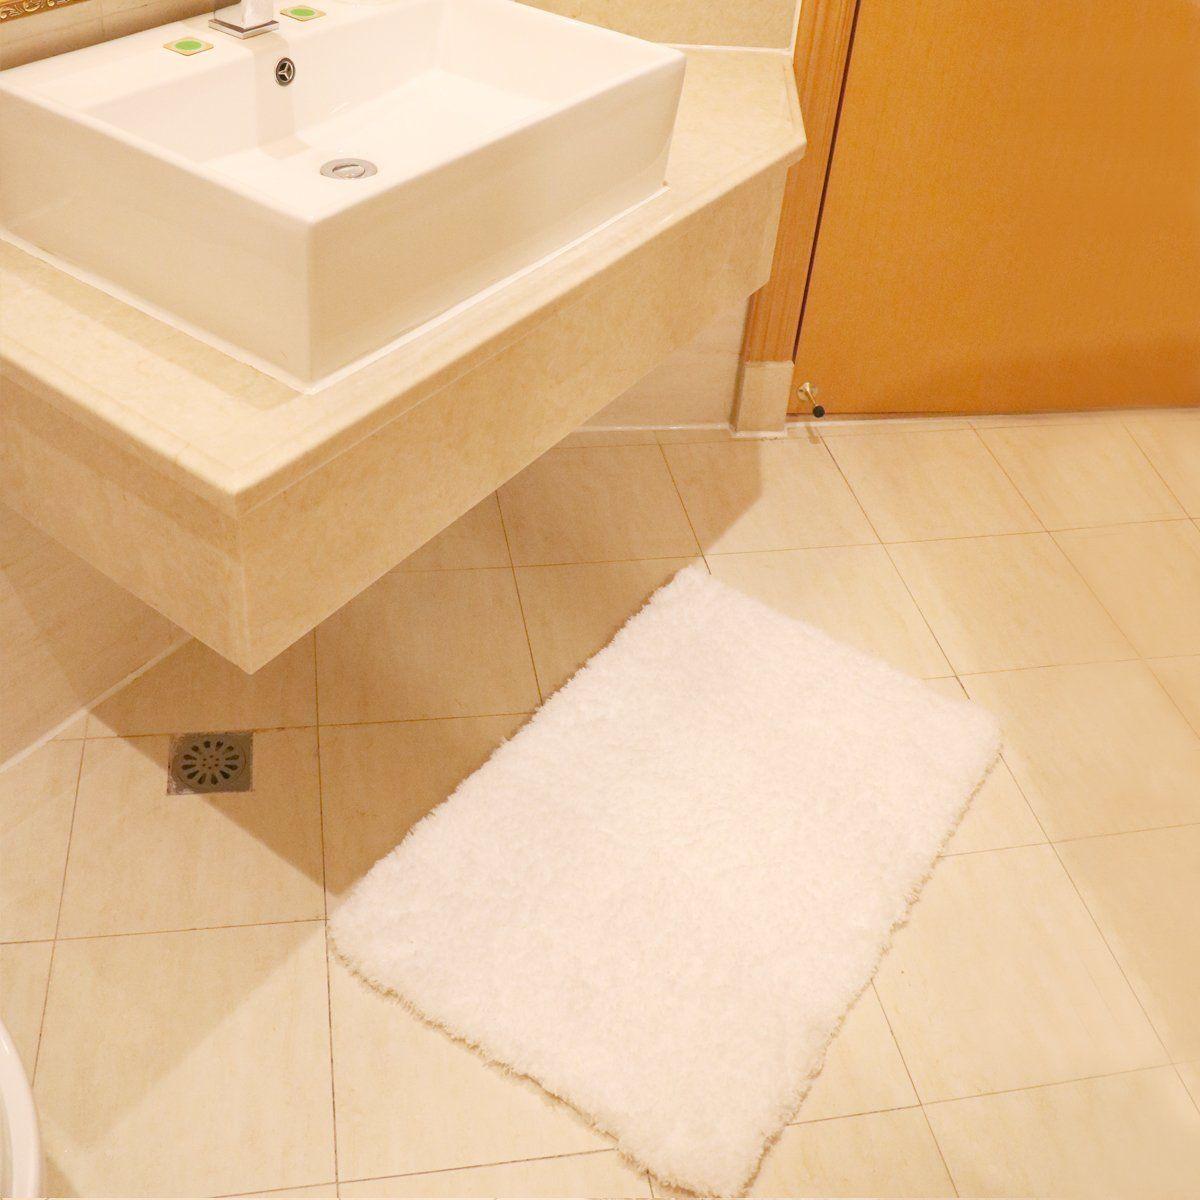 Bathroom Rugs That Absorb Water.Lochas Soft Shaggy Bath Mat Super Absorbs Water Bathroom Rugs Luxur